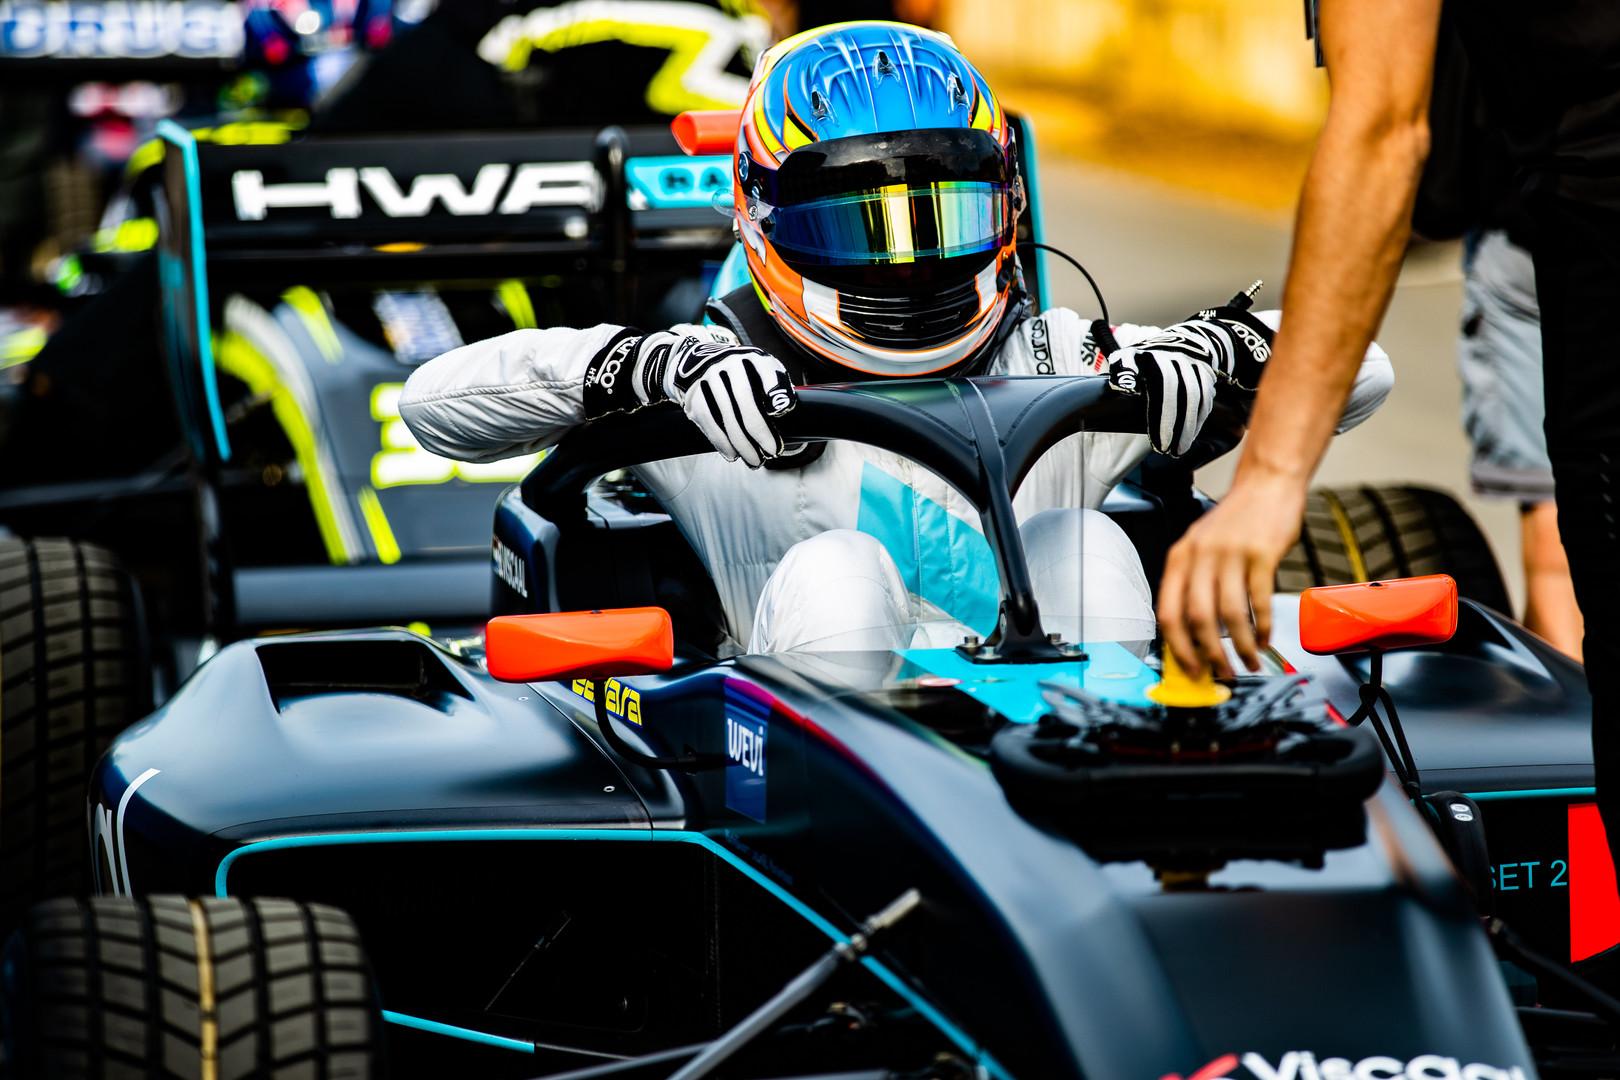 Bent F3 Paul Ricard 23-06-2019-4.jpg